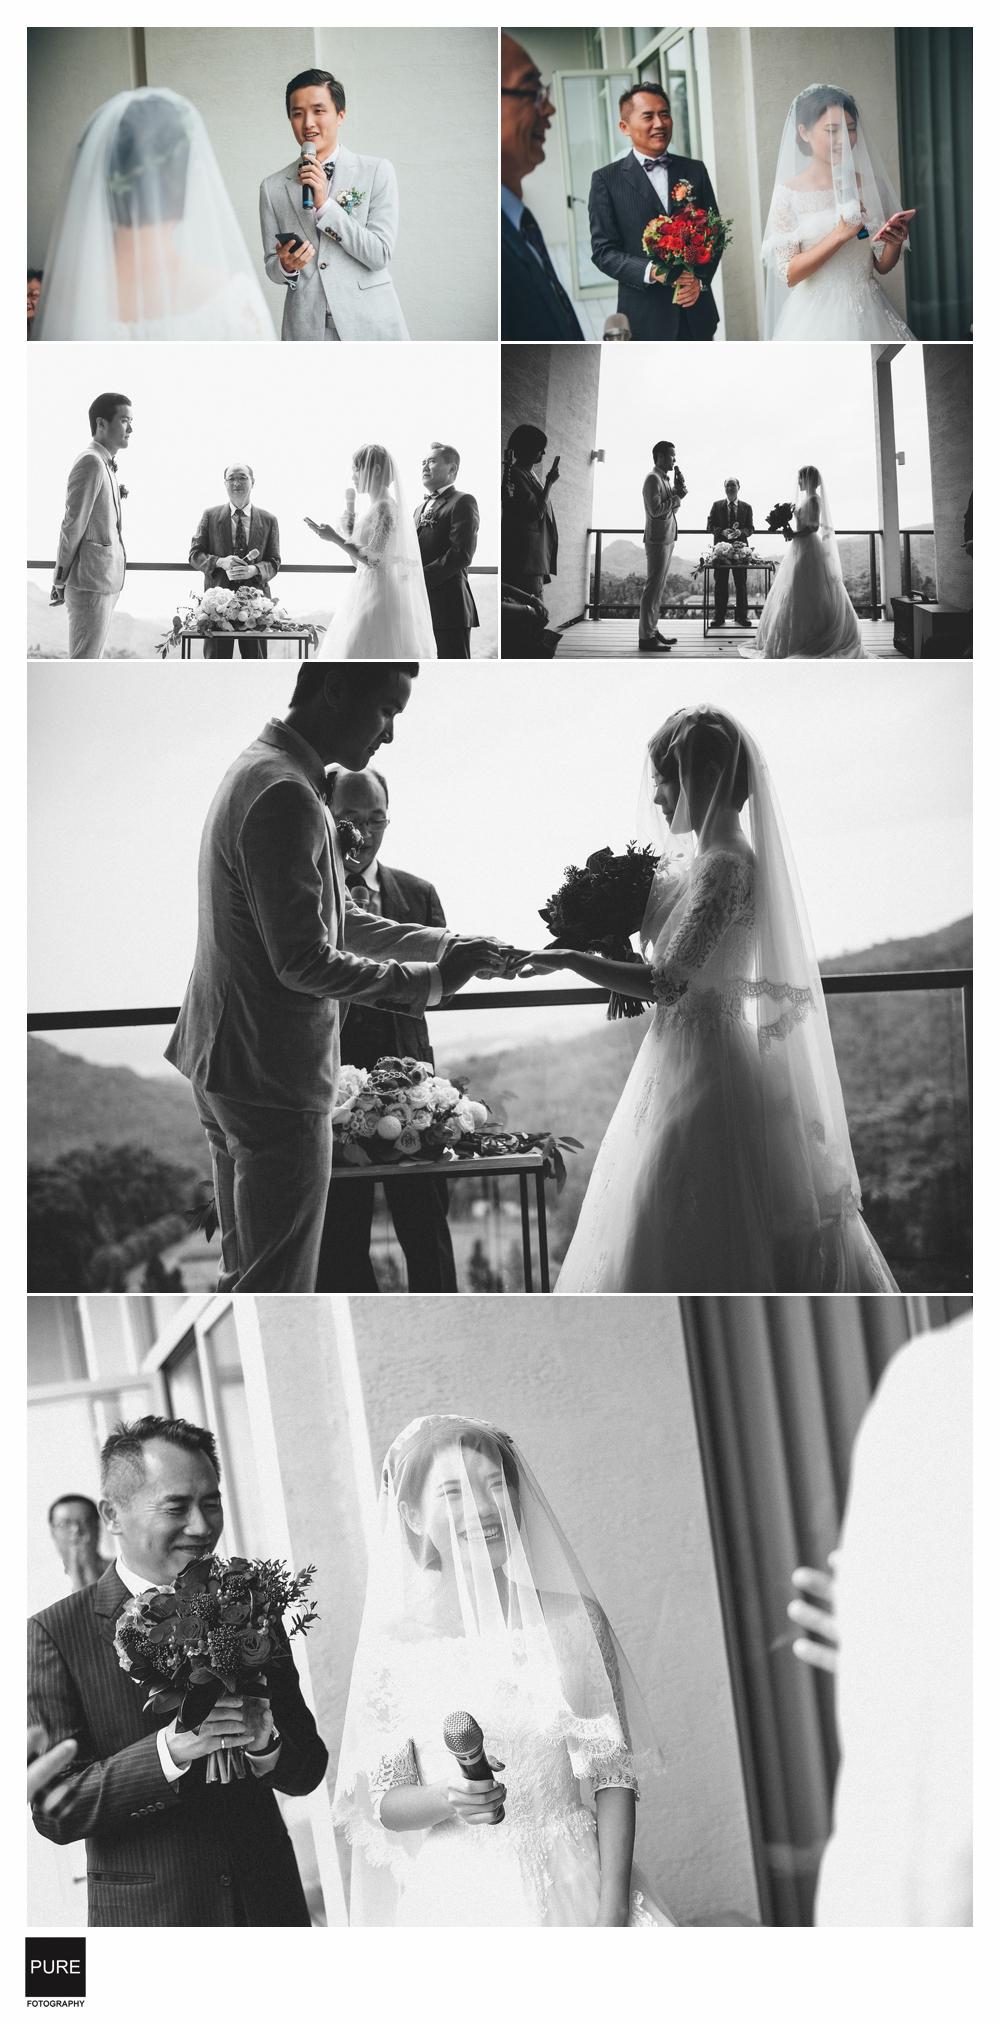 PUREFOTO_台灣婚禮平面攝影wedding_美式婚禮工作室